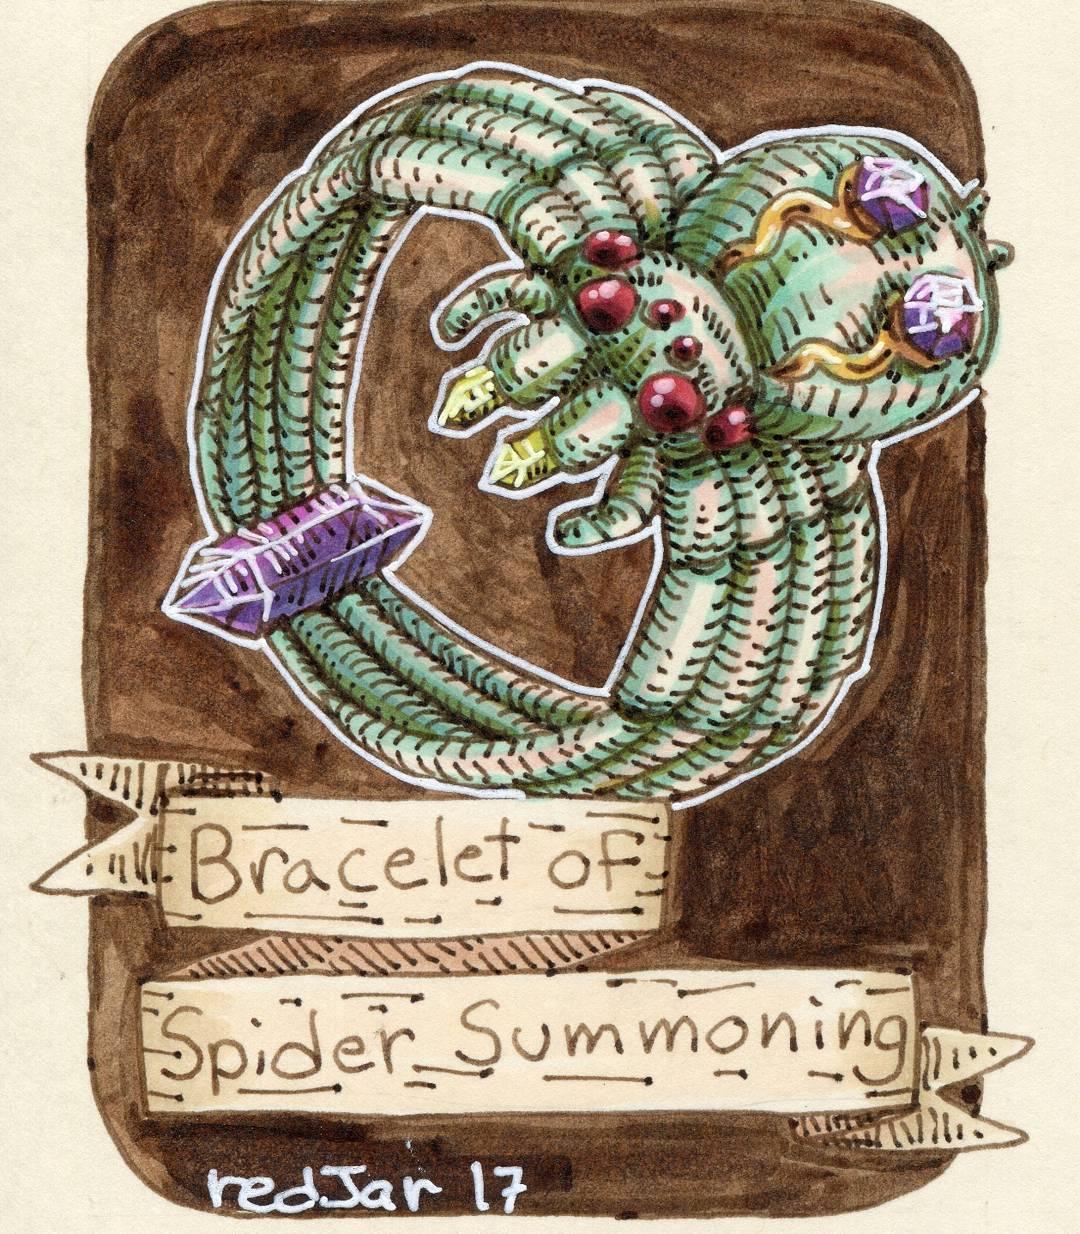 "redjarojam ""Bracelet of Spider Summoning"" - by Jared DeCosta (redjarojam) www.instagram.com/redjarojam (2017-04) © dell'autore tutti i diritti riservati"